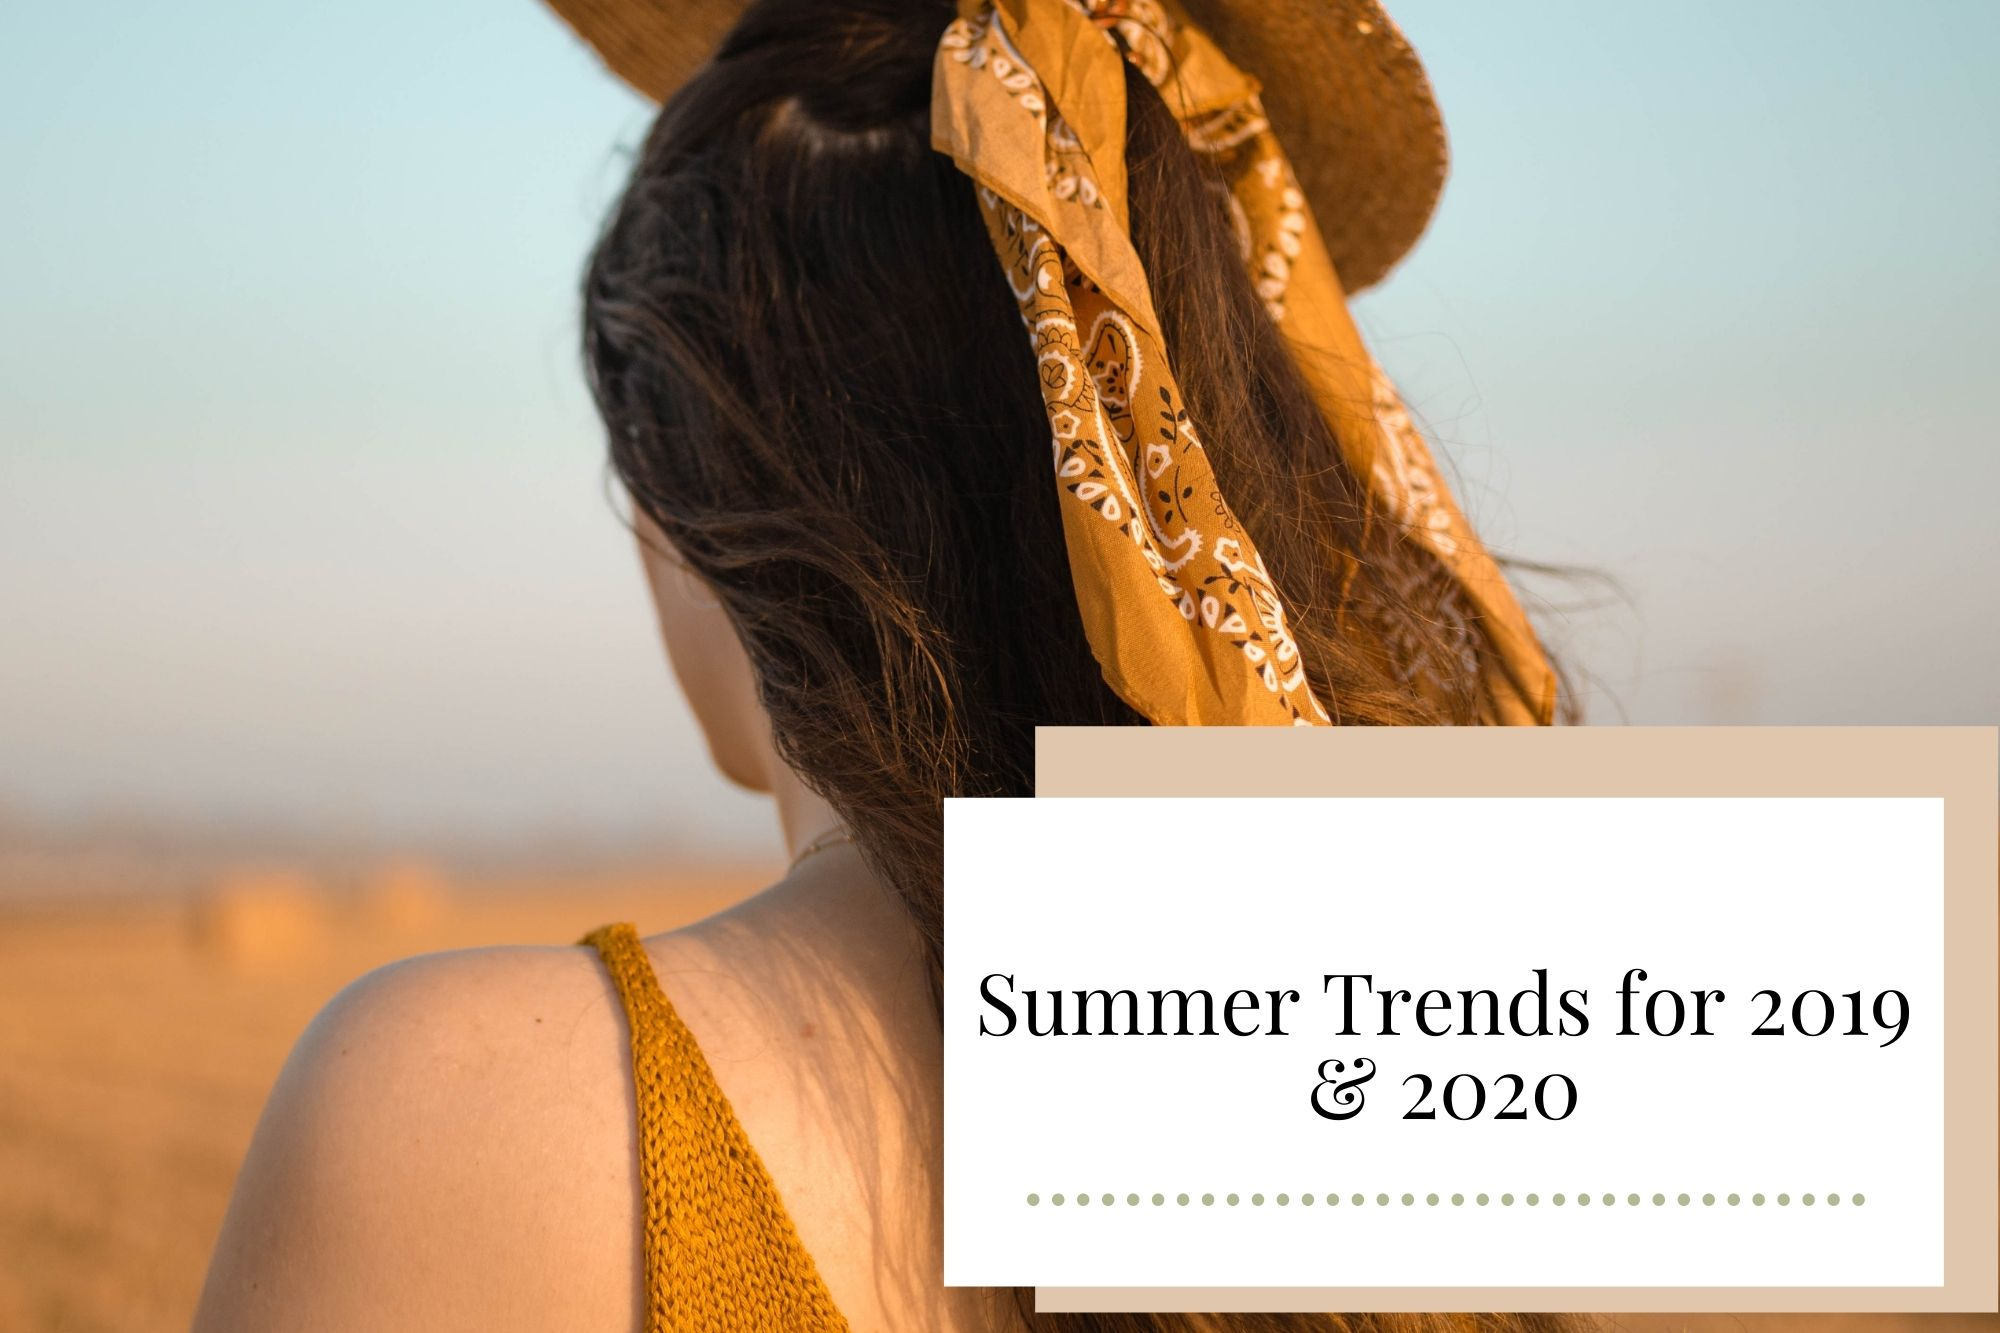 Summer Trends for 2019 & 2020 - Newcastle Hair Salon - Blanc Hair Studio